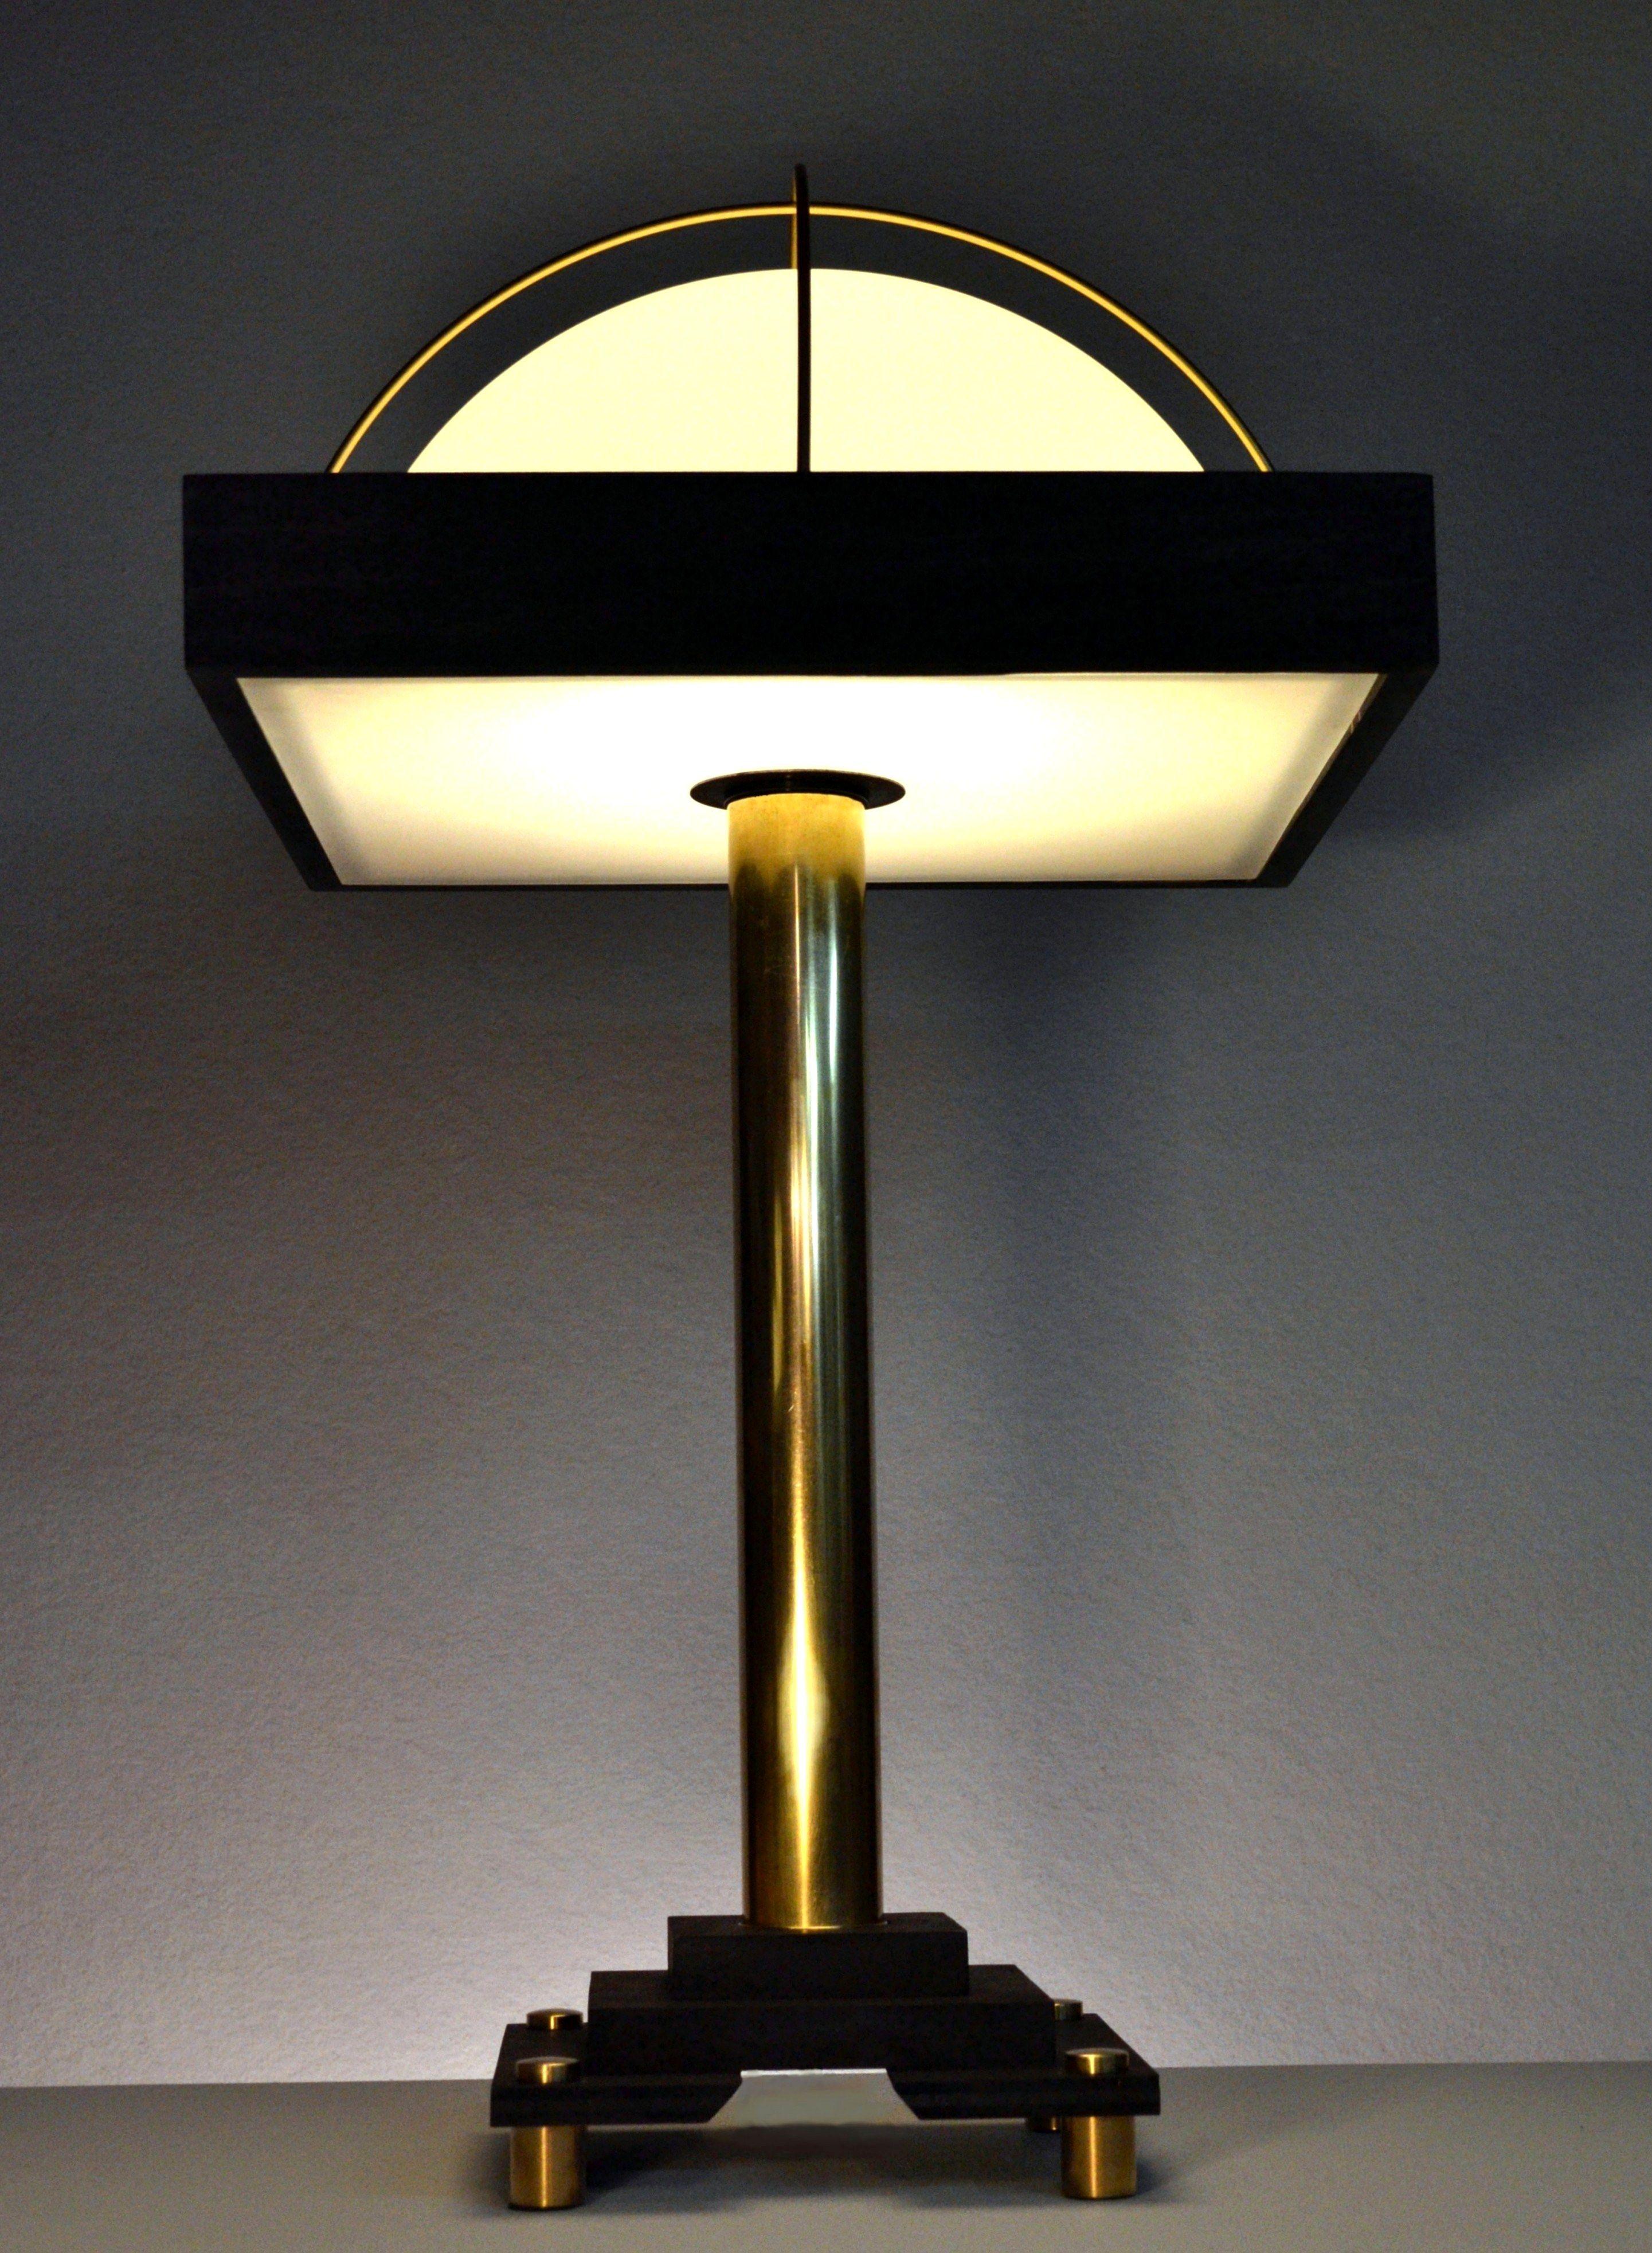 handmade lighting design. Marie Claire Salon Lamp. Designed And Handmade By Art Donovan Lighting Design G